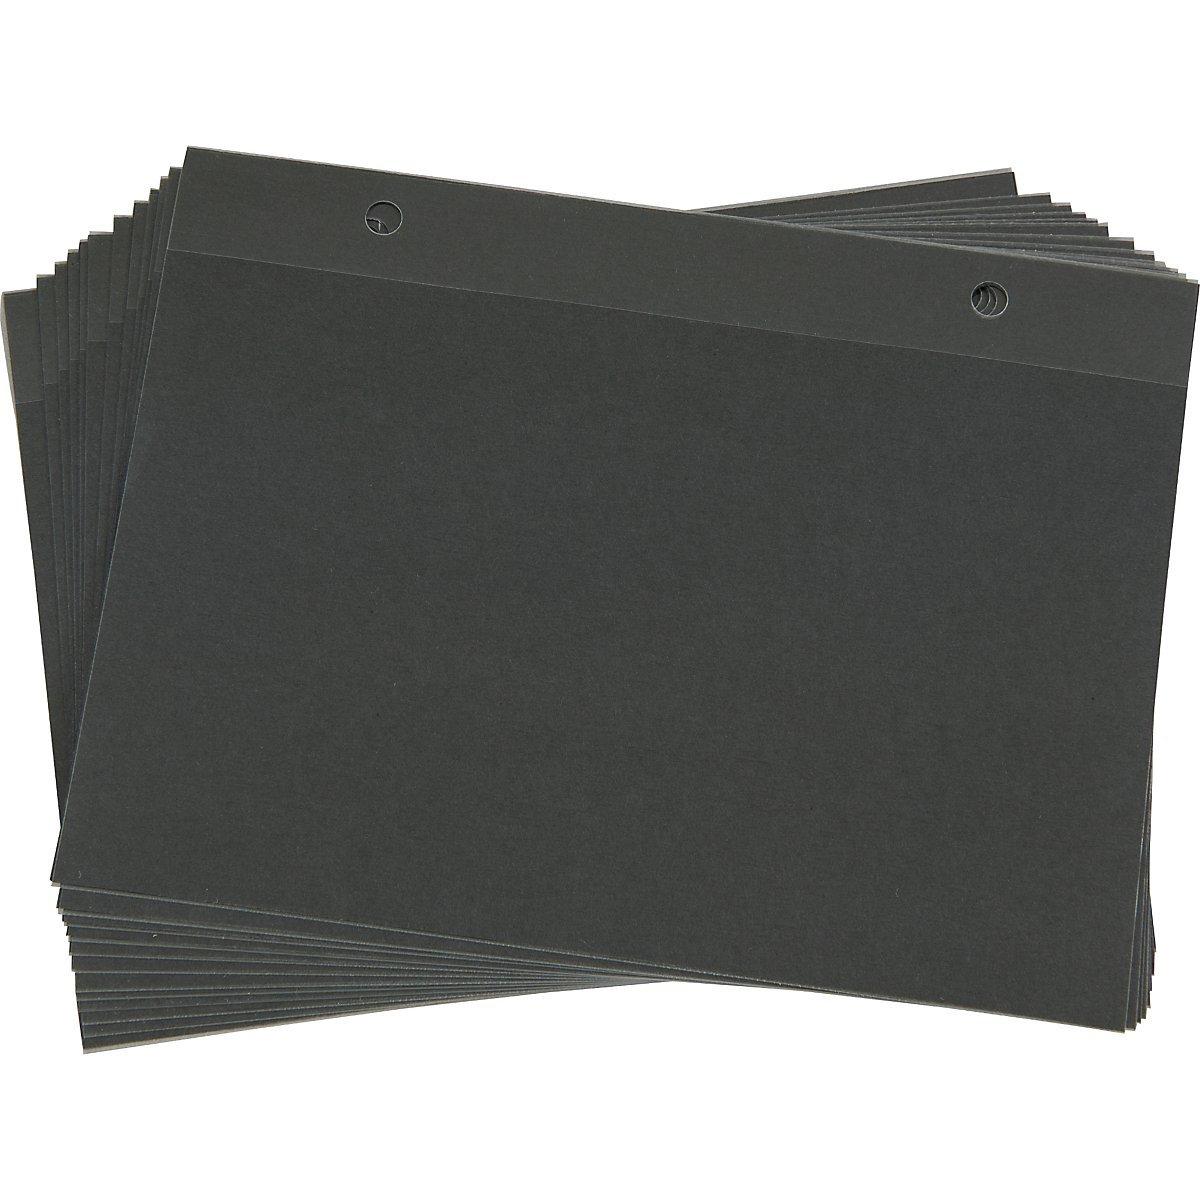 Flip Folder Windows